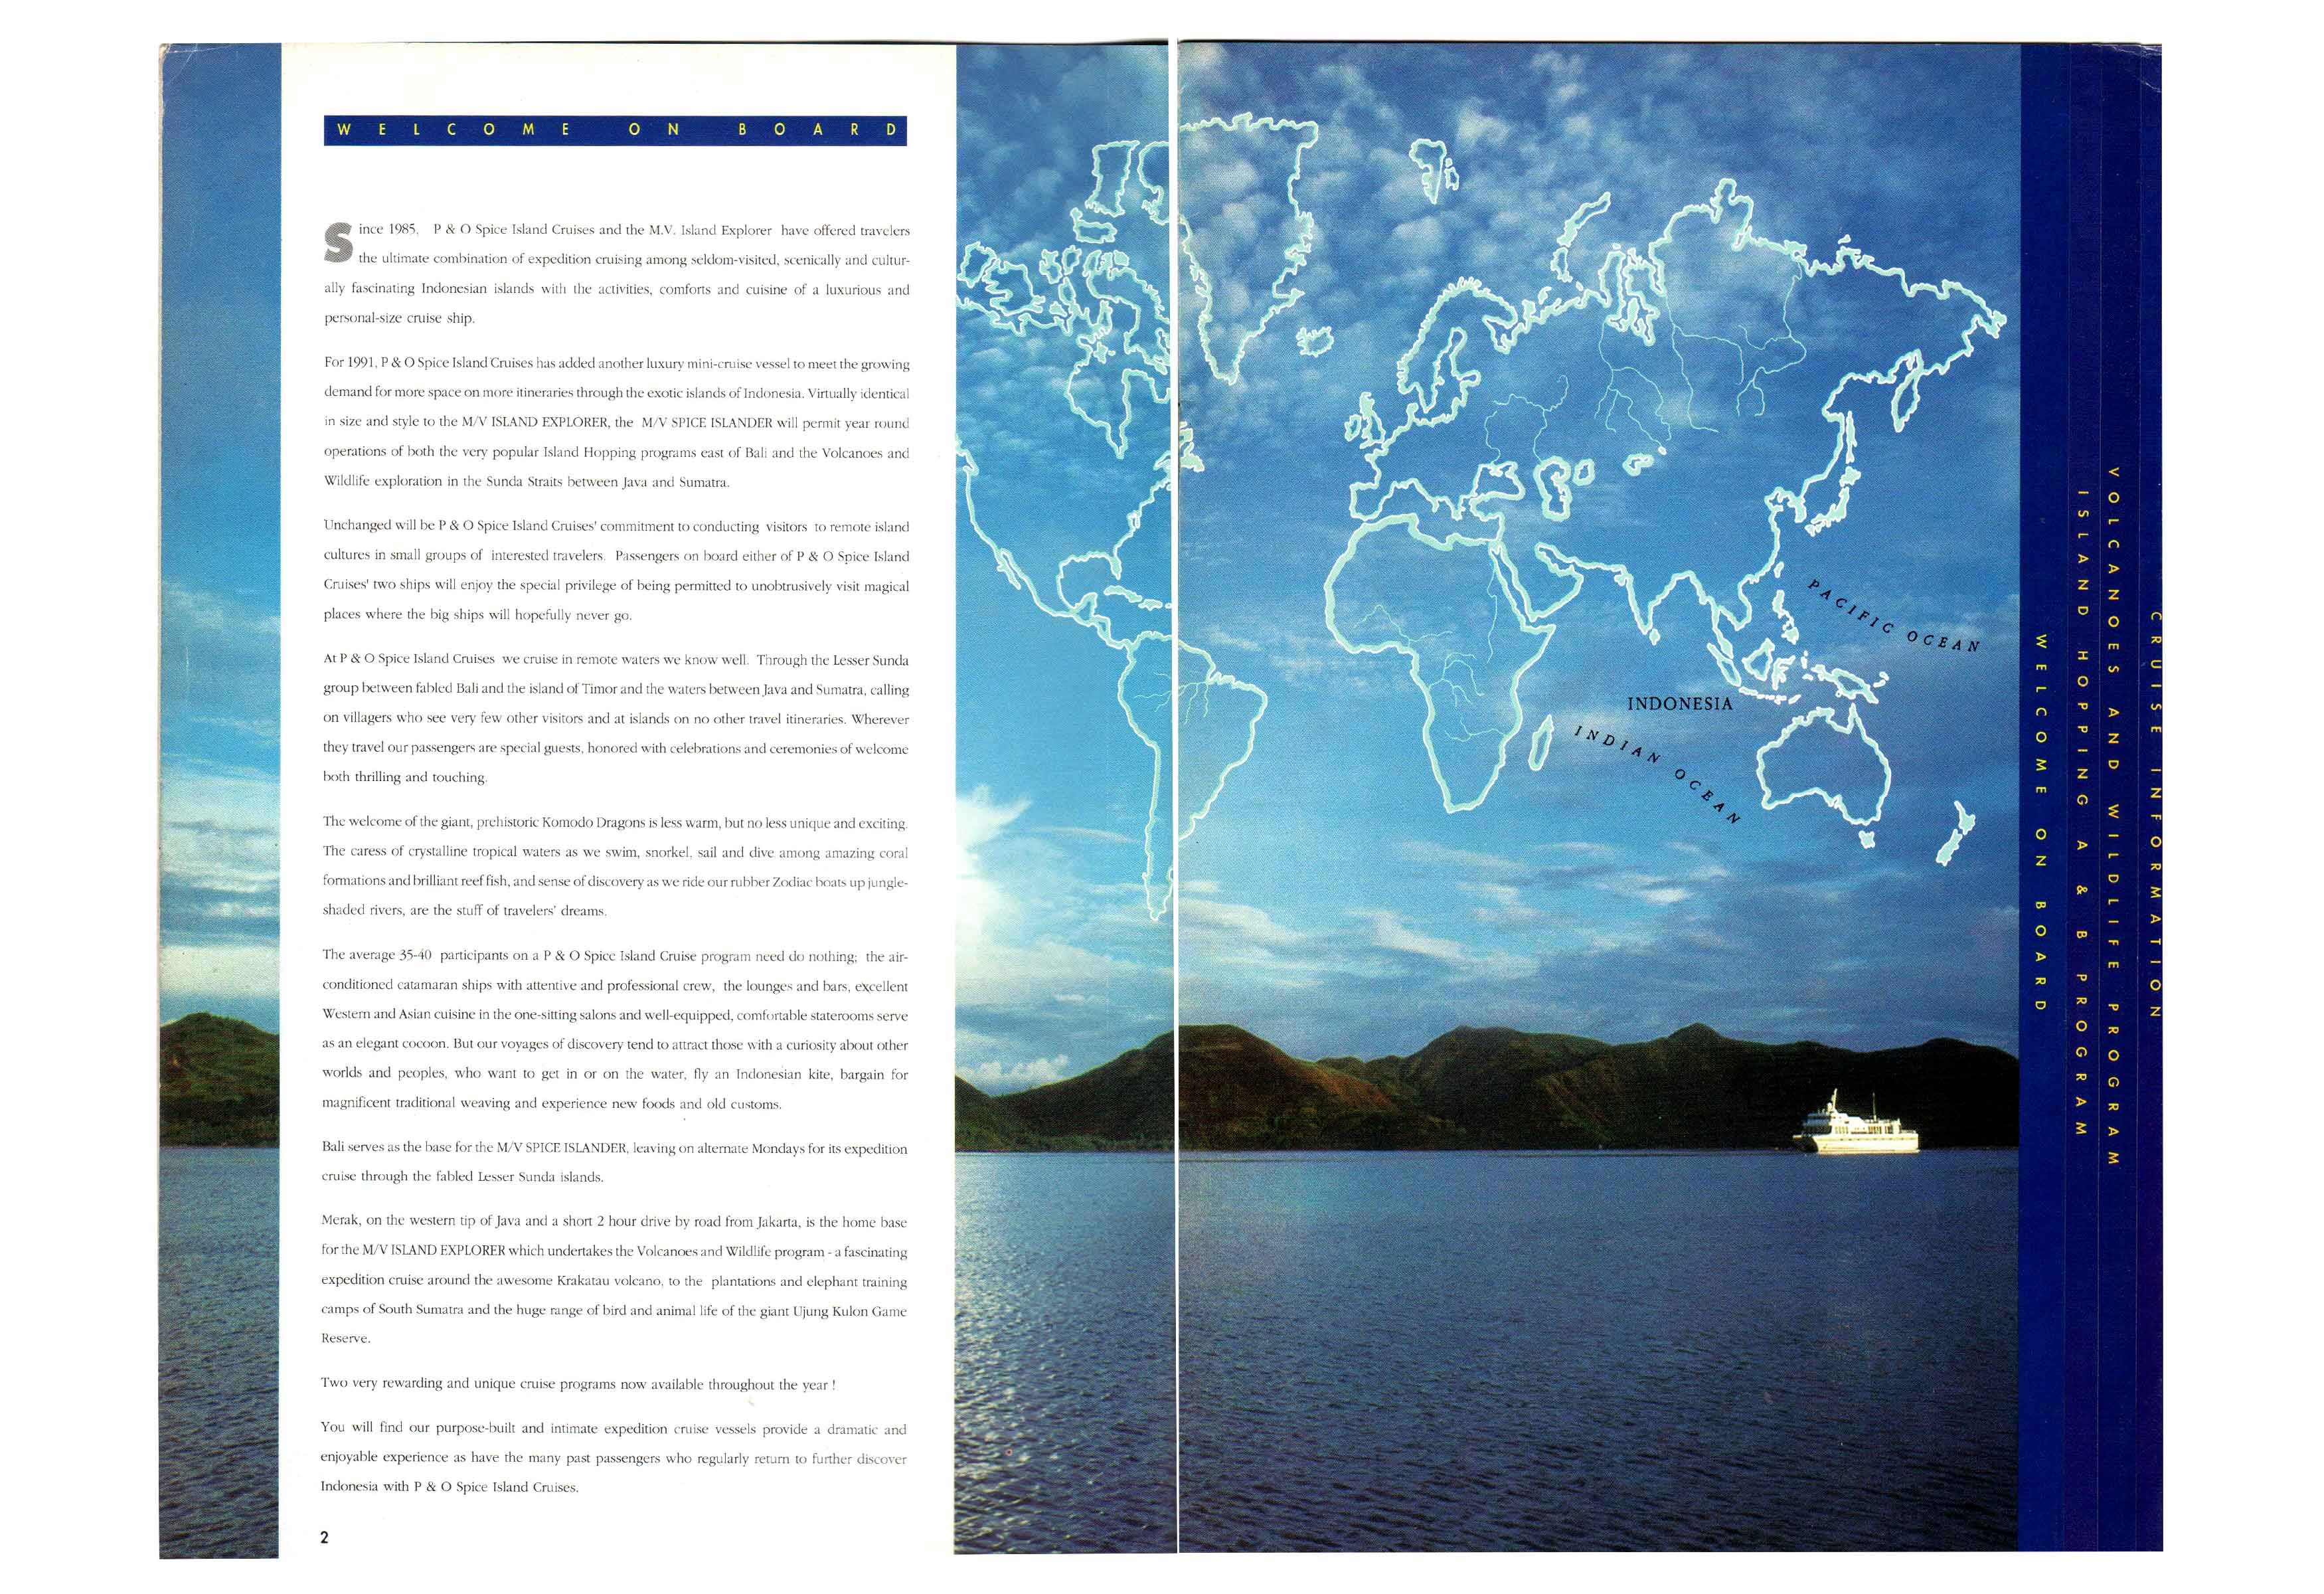 Spread Indonesia Expedition Cruises